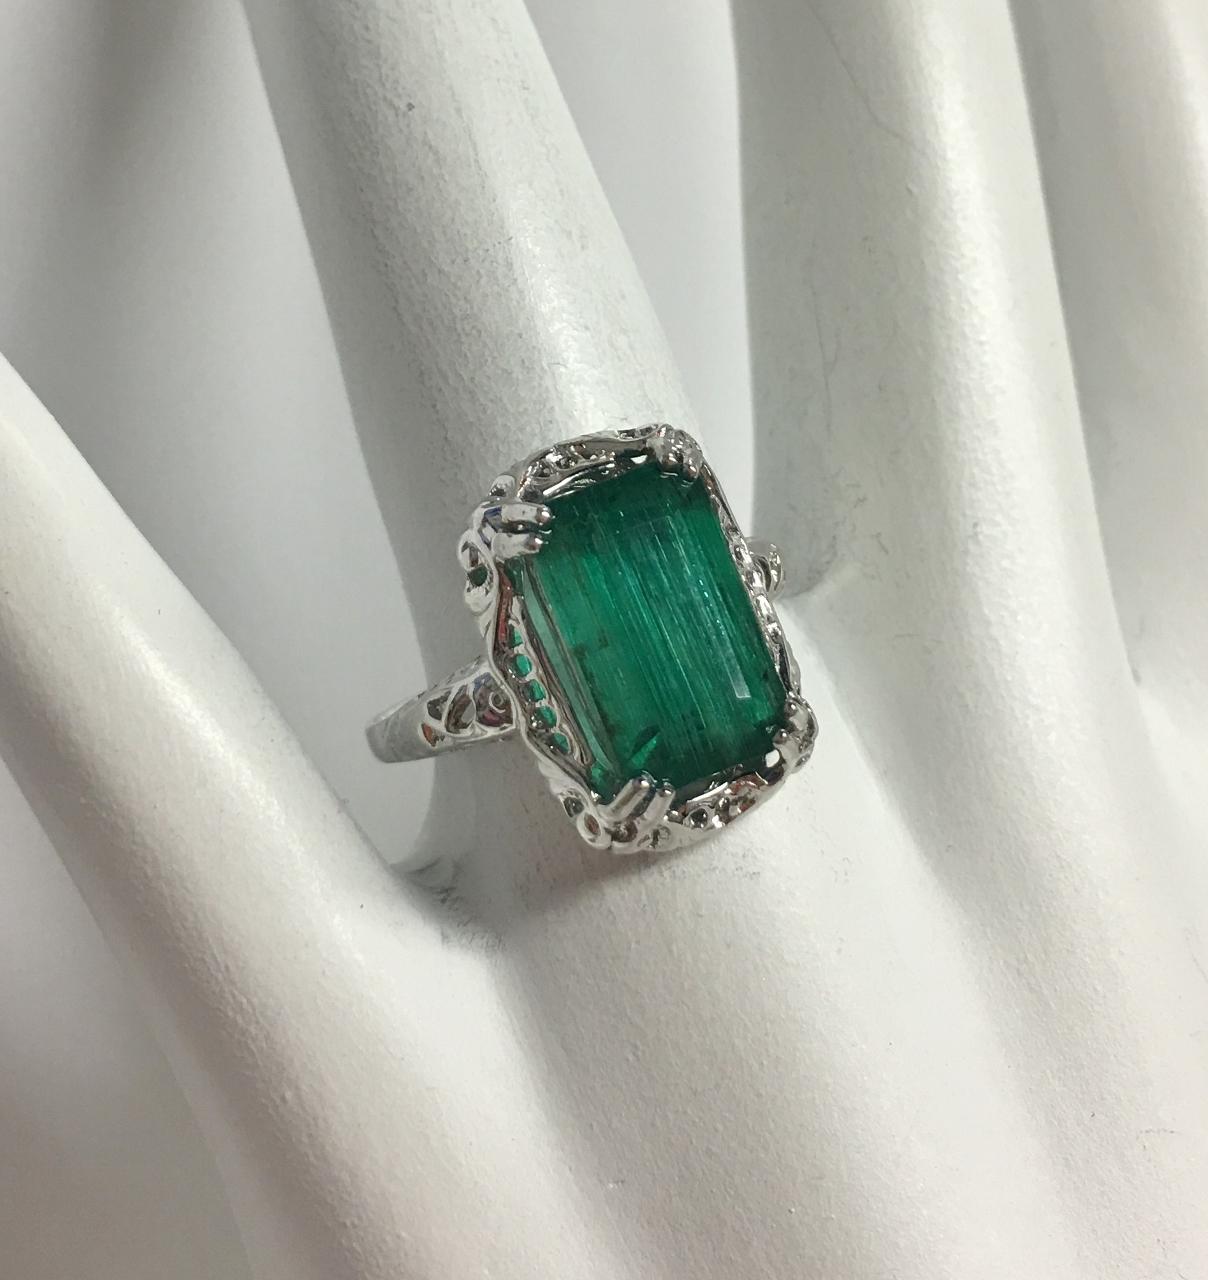 3.75 Carats Emerald Ring